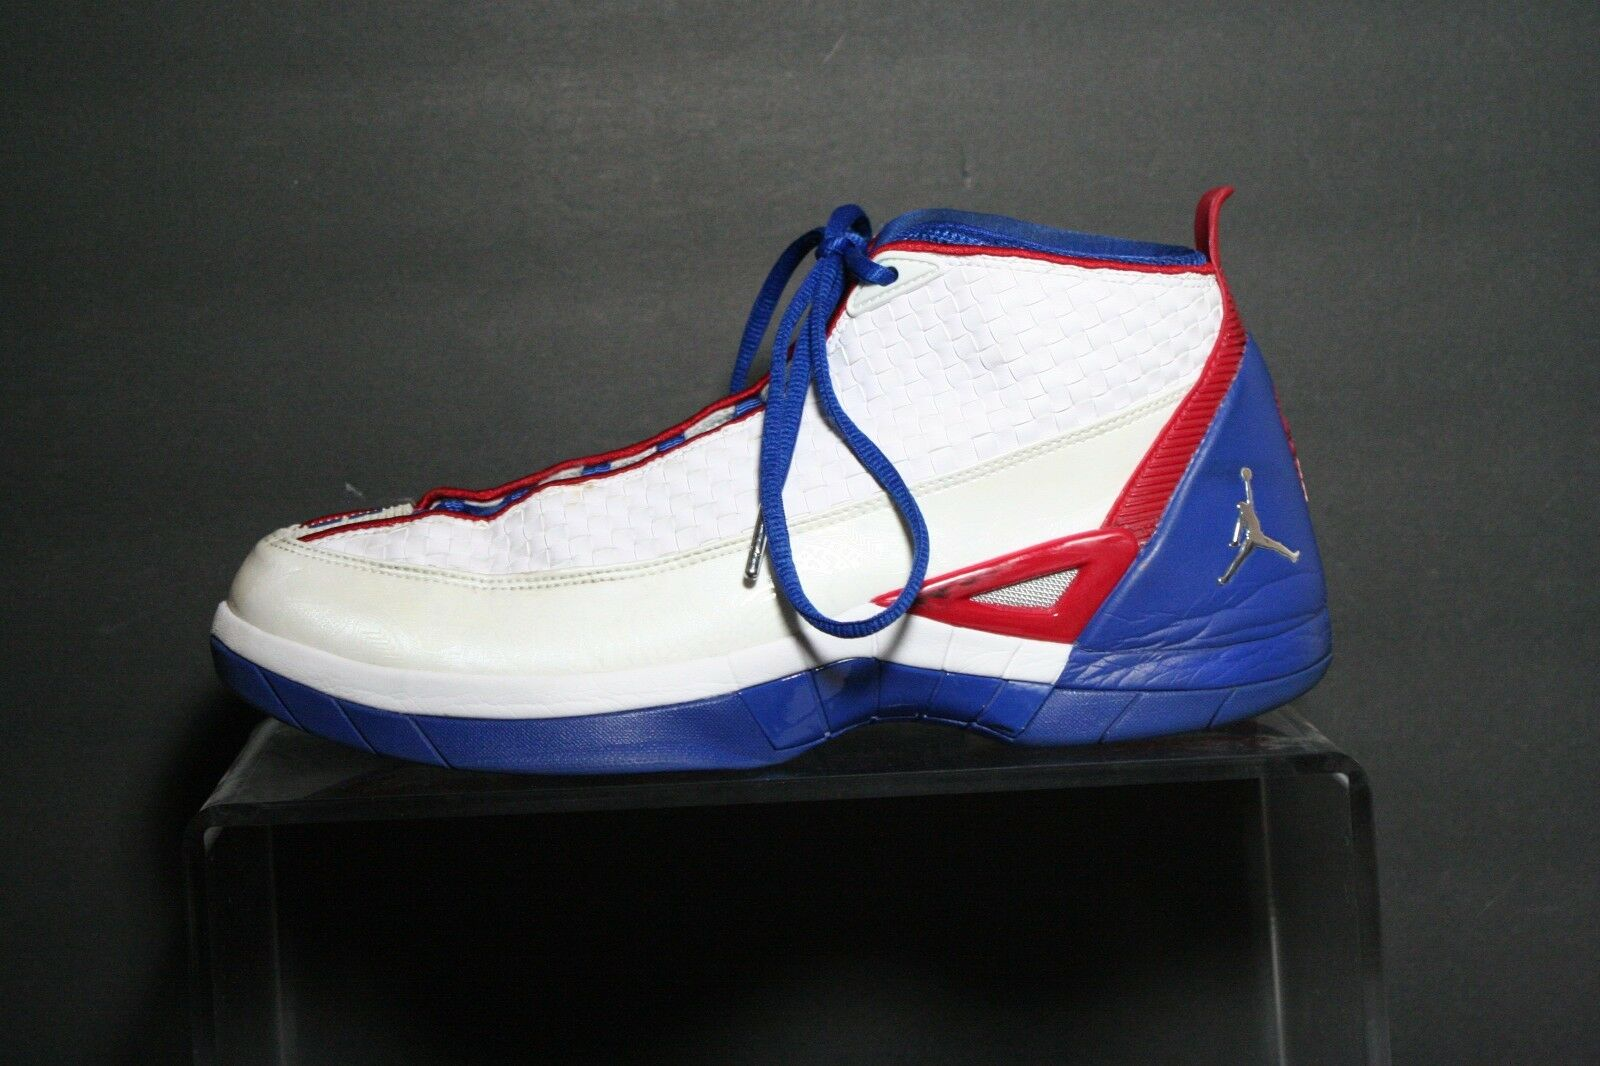 Nike air jordan, jordan, jordan, 15 se retro - 2007 - usa sportliche zehn olympischen basketball 6708a3